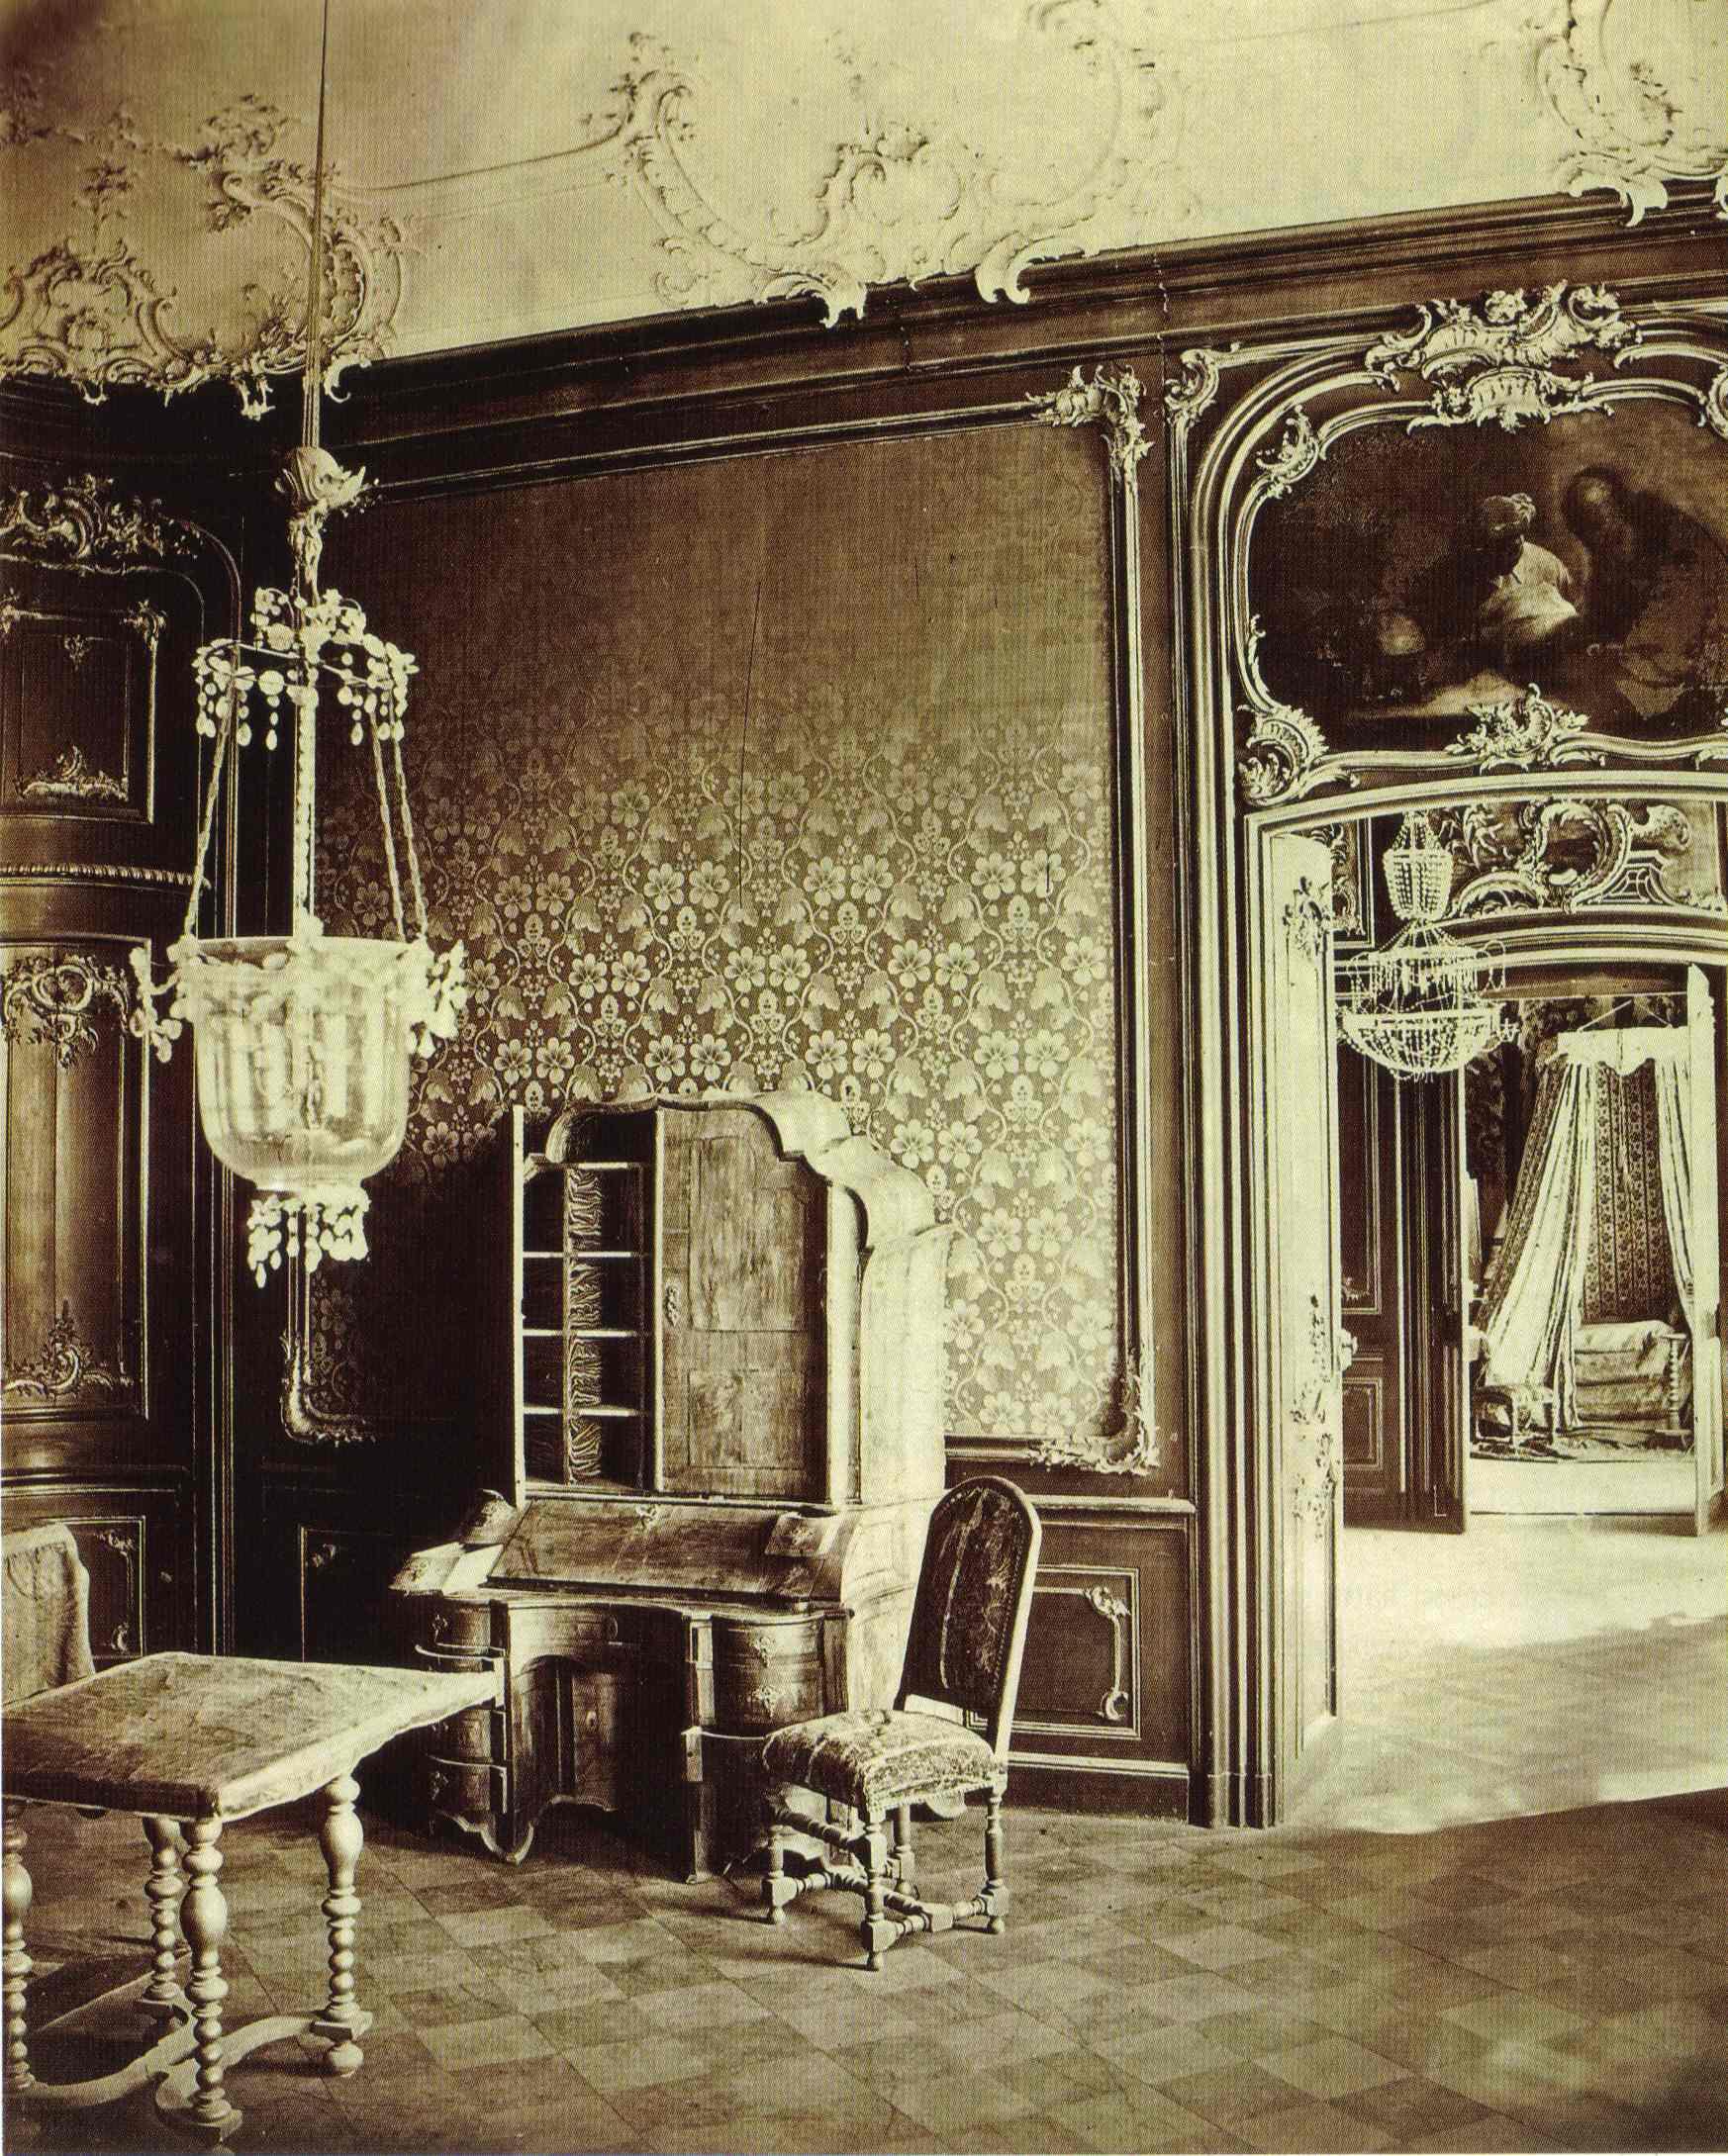 Datei:Georg Maria Eckert - Schloss Bruchsal, Pagenzimmer 1870.jpg ...